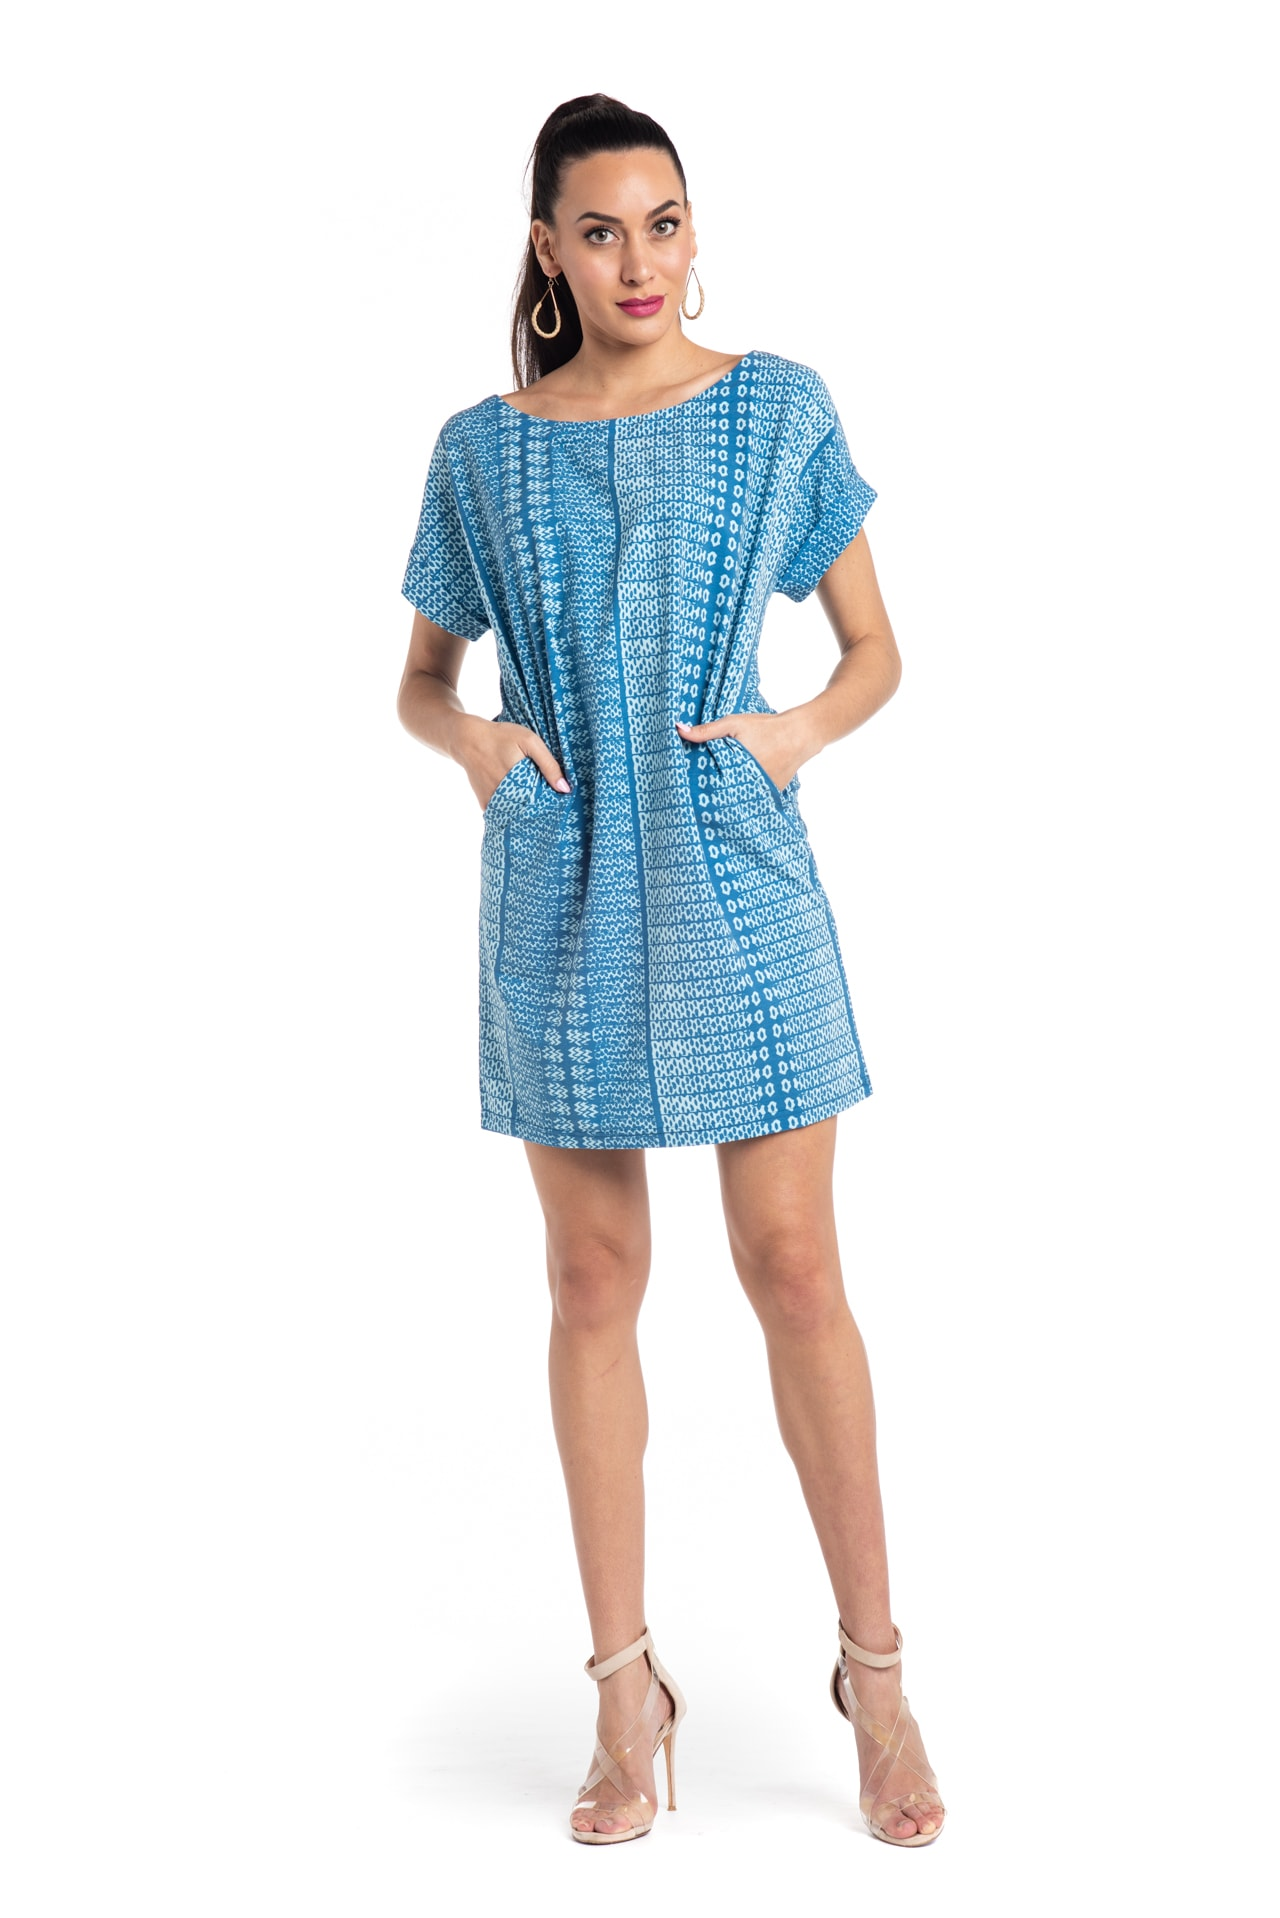 Model wearing Puaniu Shift Dress in Light Blue - Front View